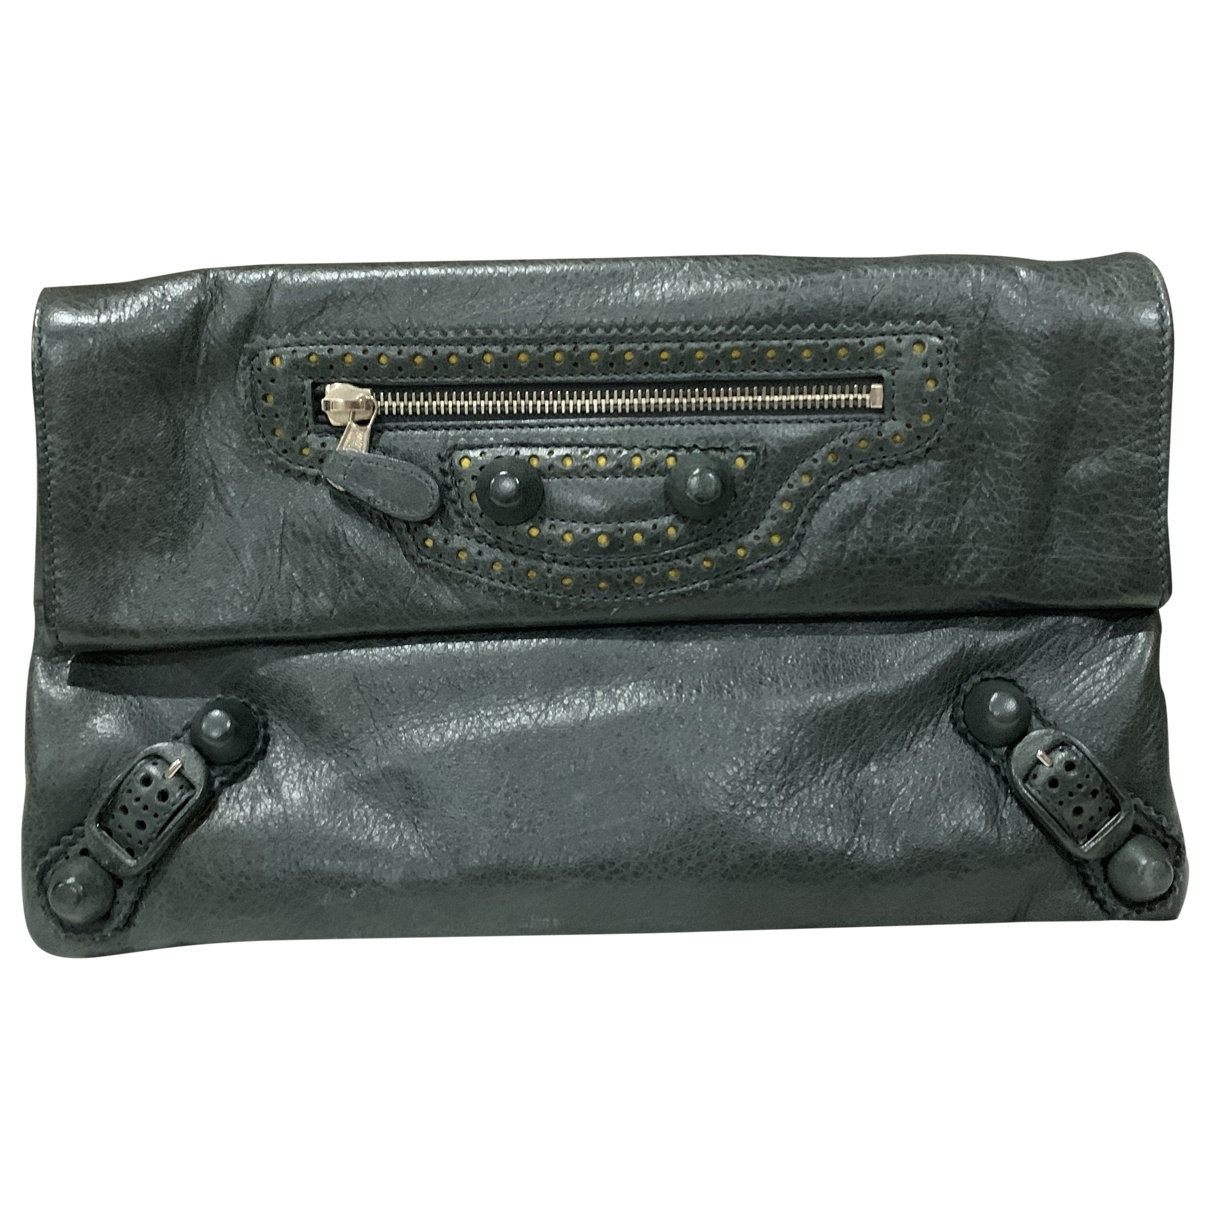 Balenciaga Envelop Clutch in  Gruen Leder